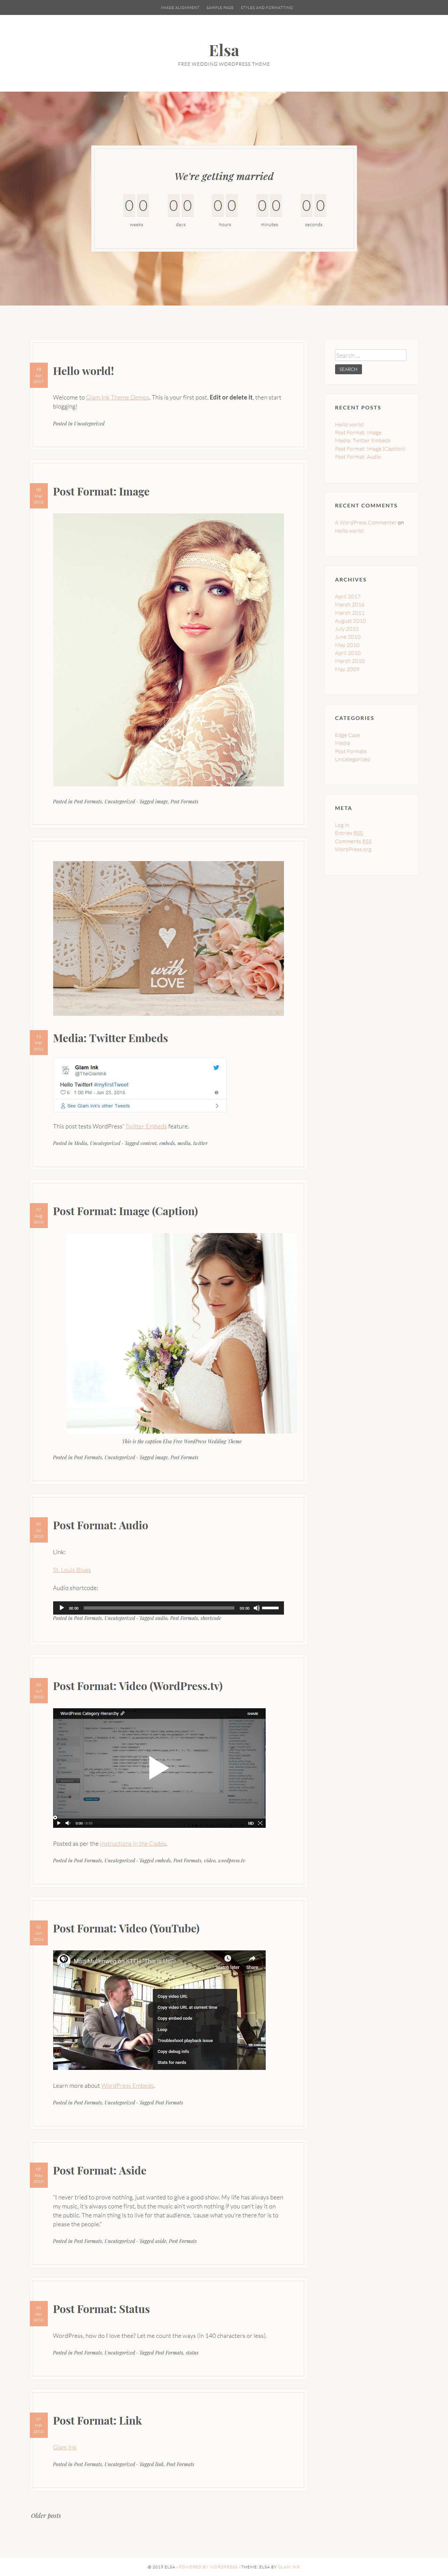 elsa best free feminine wordpress theme - 10+ Best Free Feminine WordPress Themes